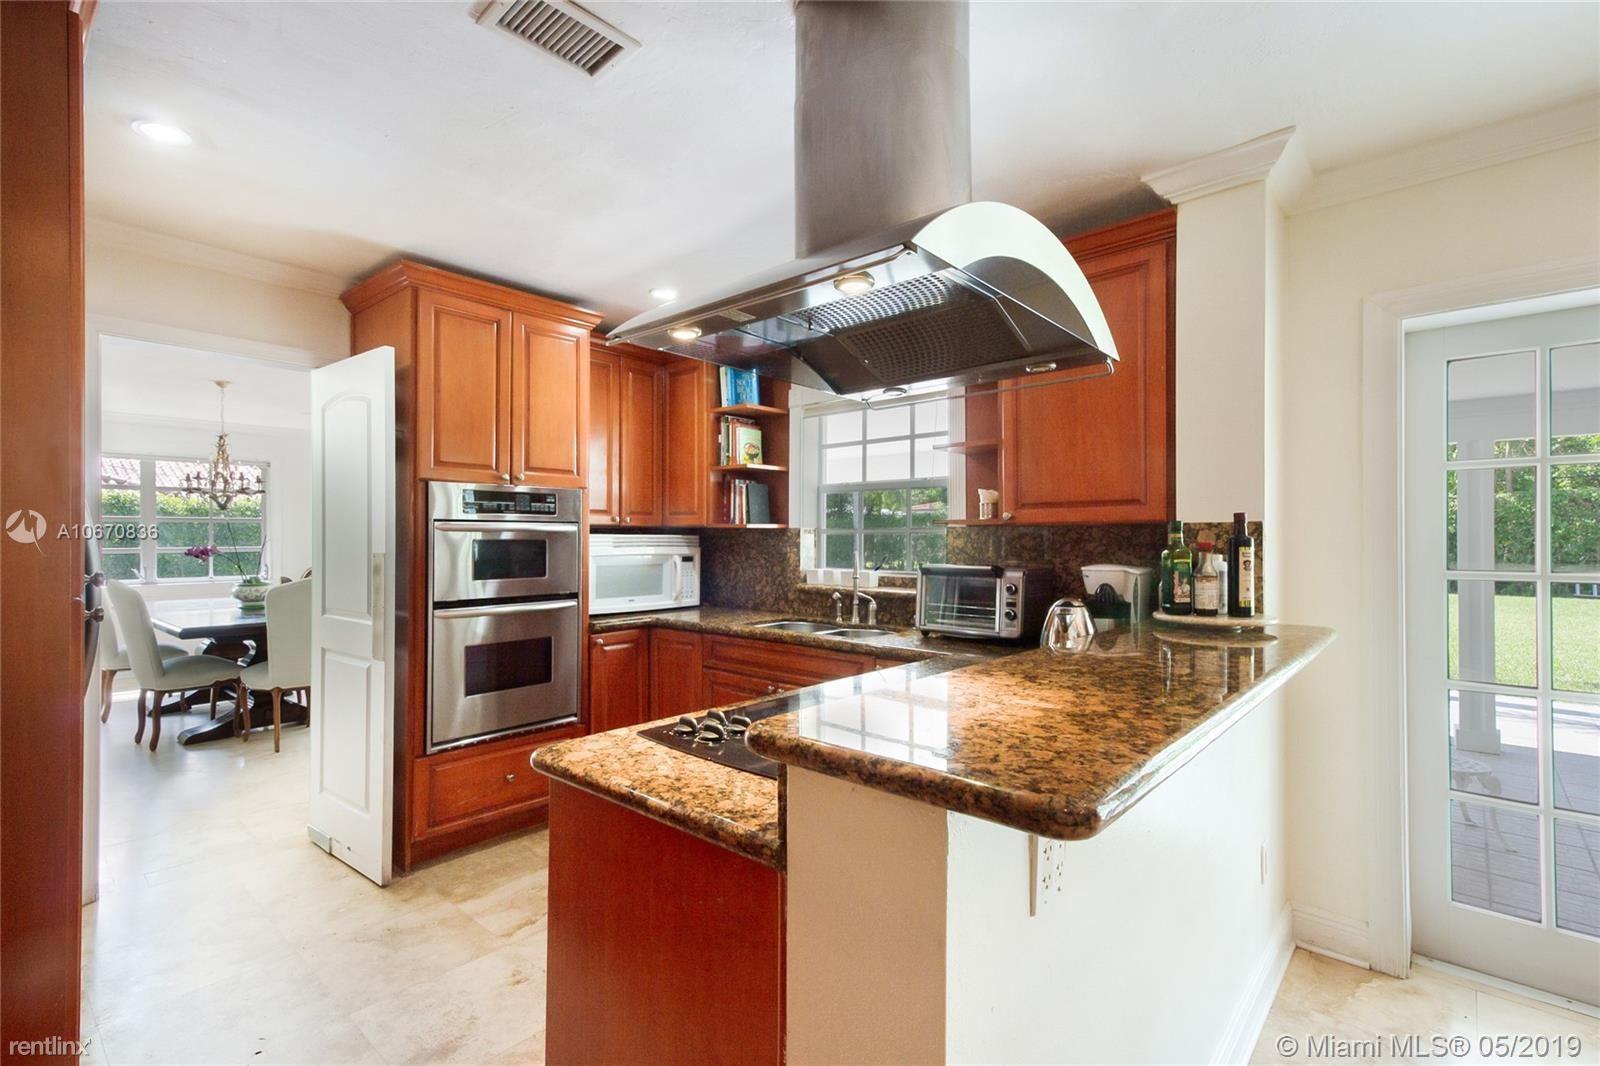 730 SW 80th St, Coral Gables, FL - $8,800